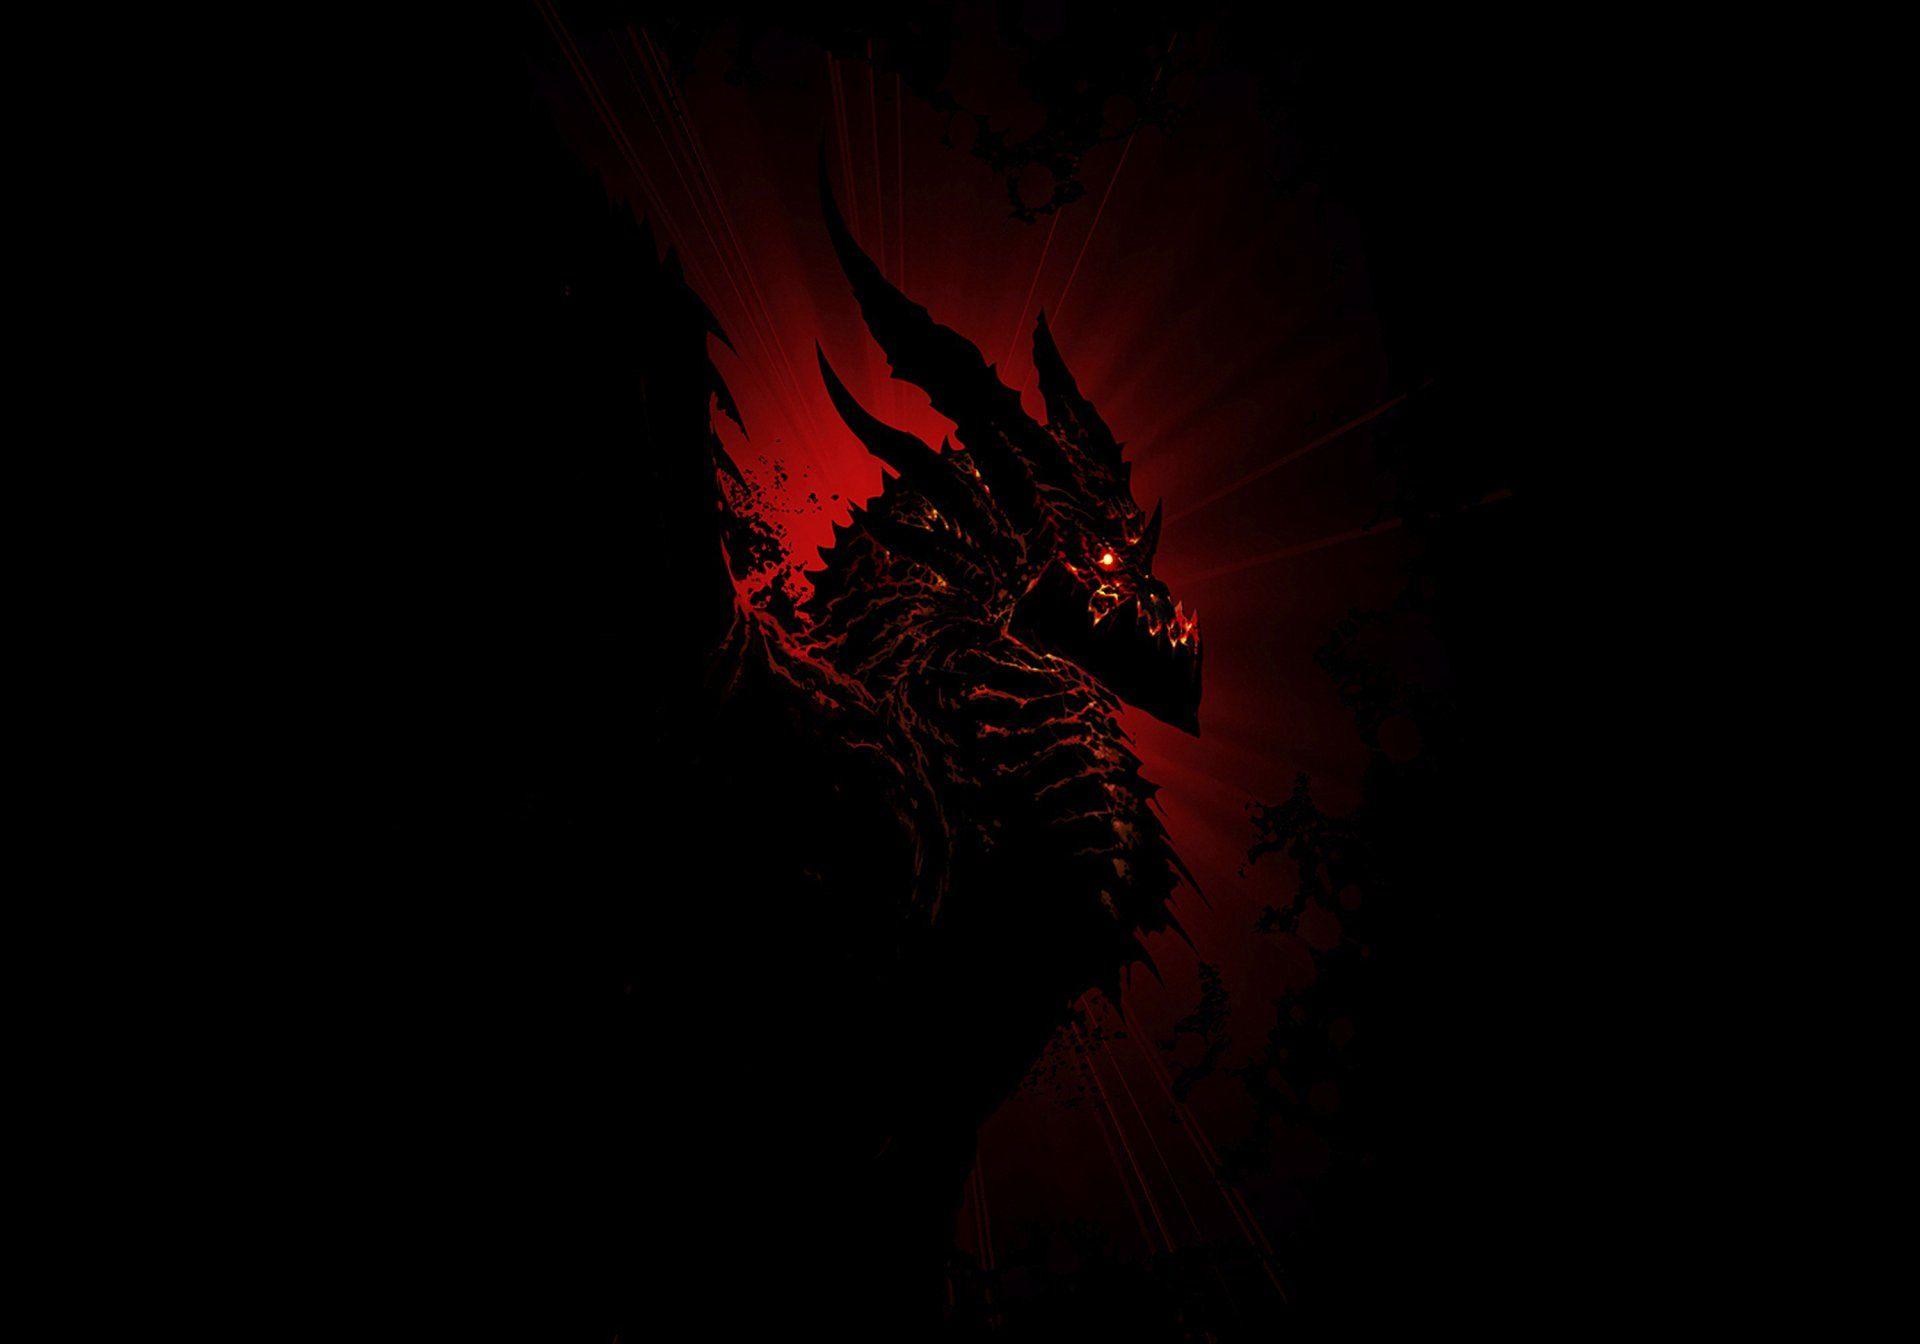 Warcraft World Of Warcraft Fantasy Mmorpg Deathwing Black Dragon